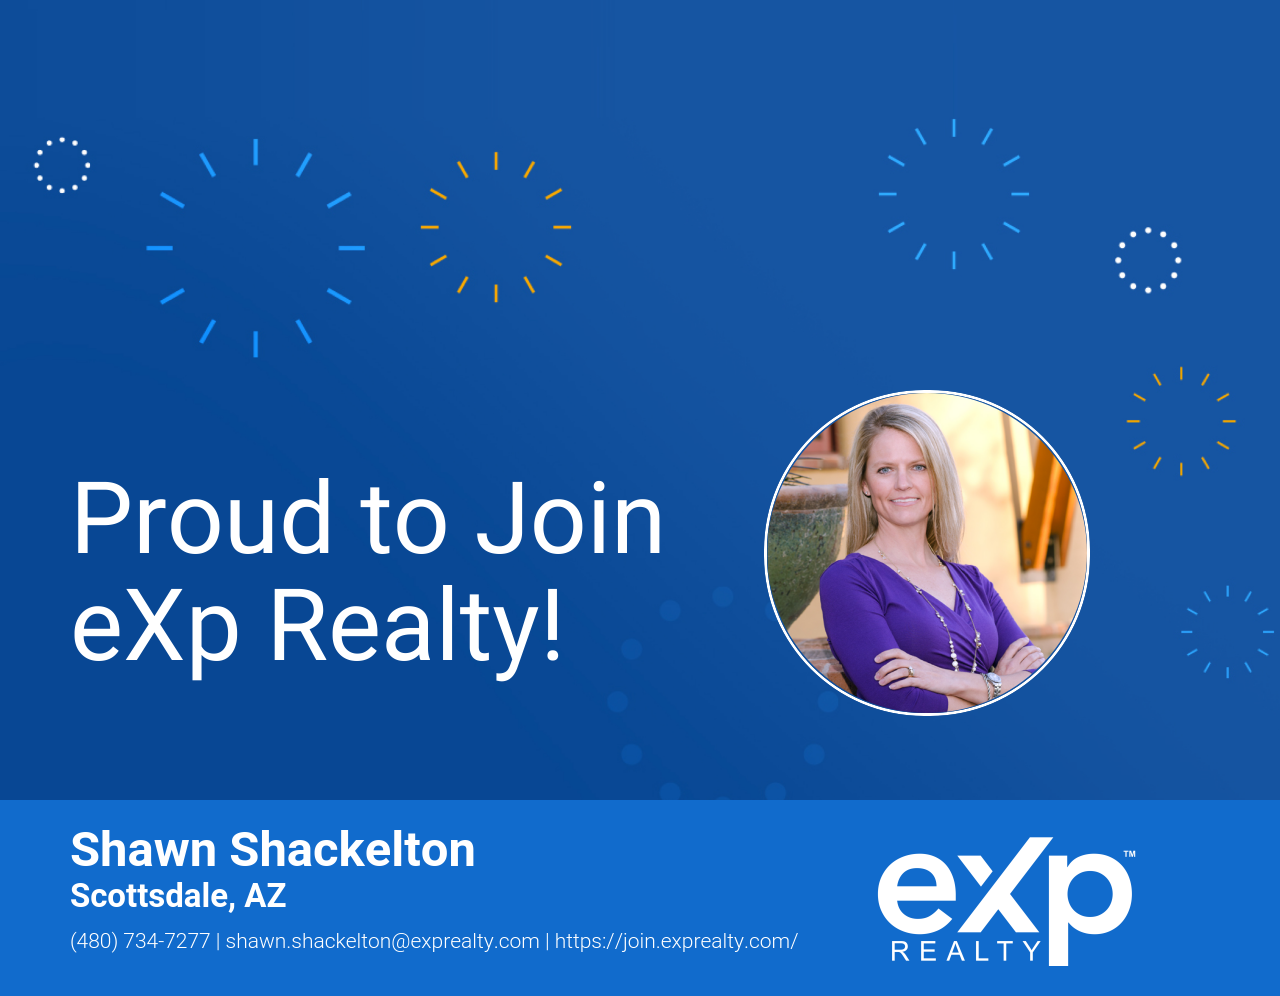 Shawn Shackelton Joined eXp Realty!